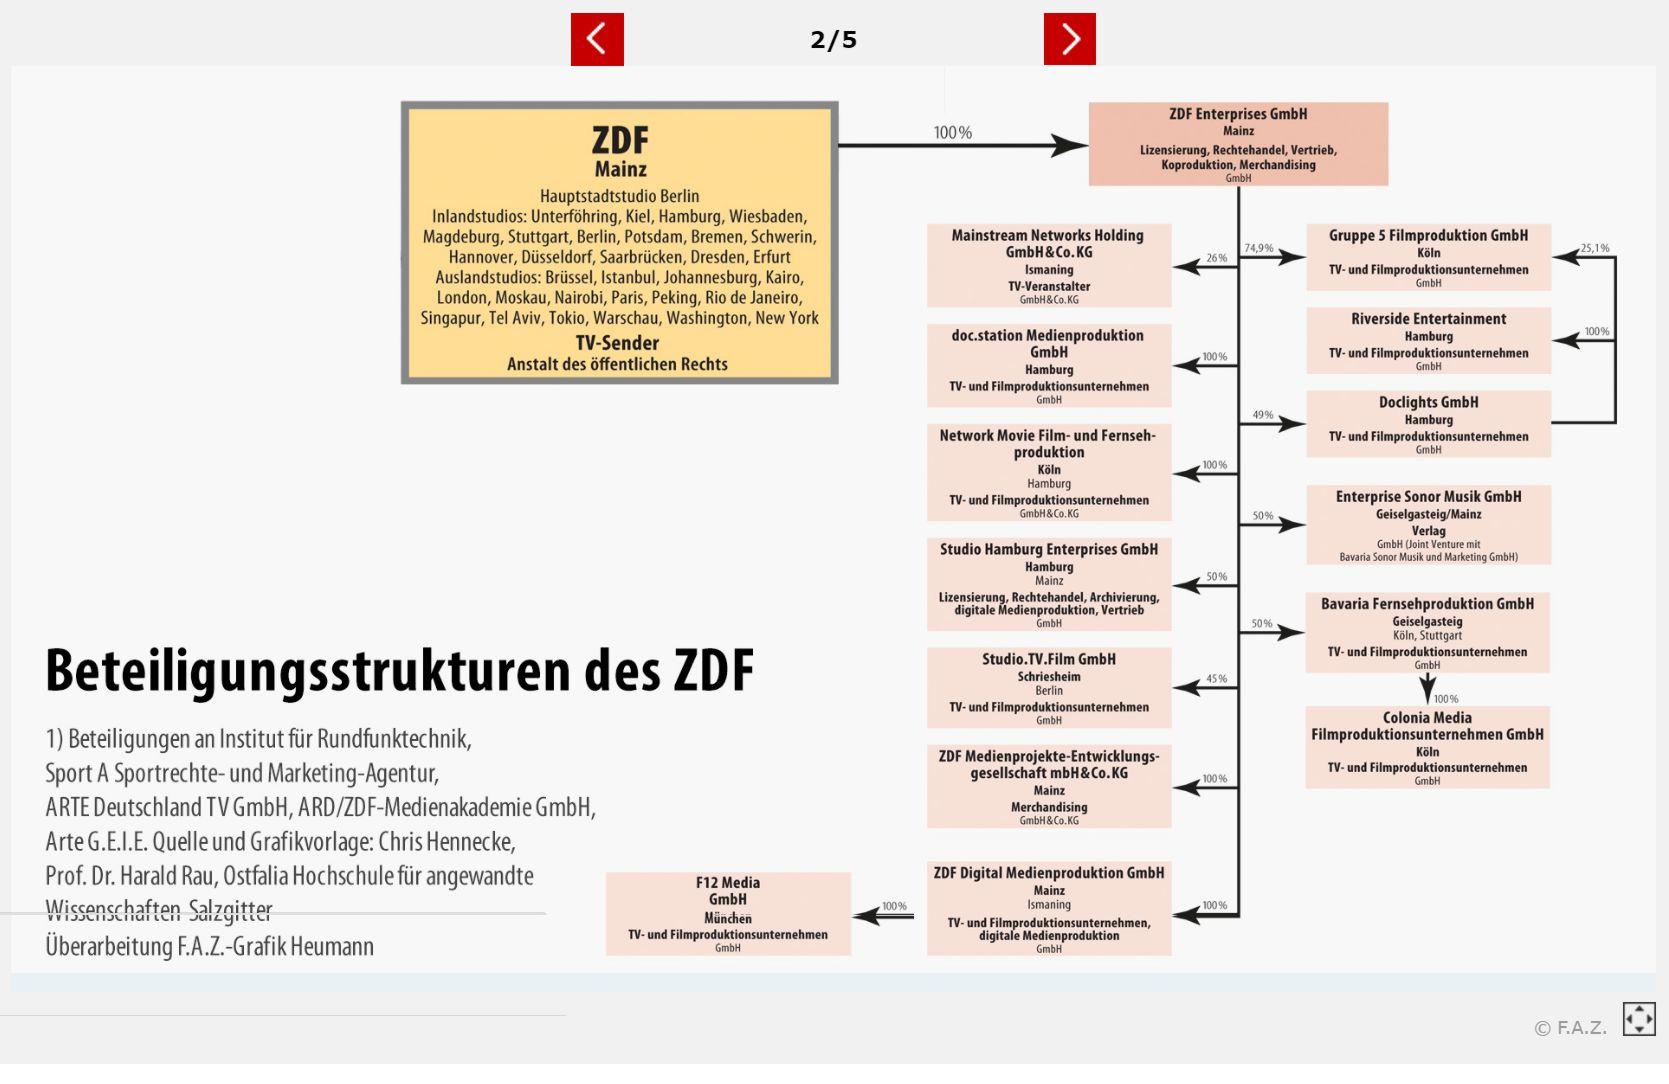 zdf77